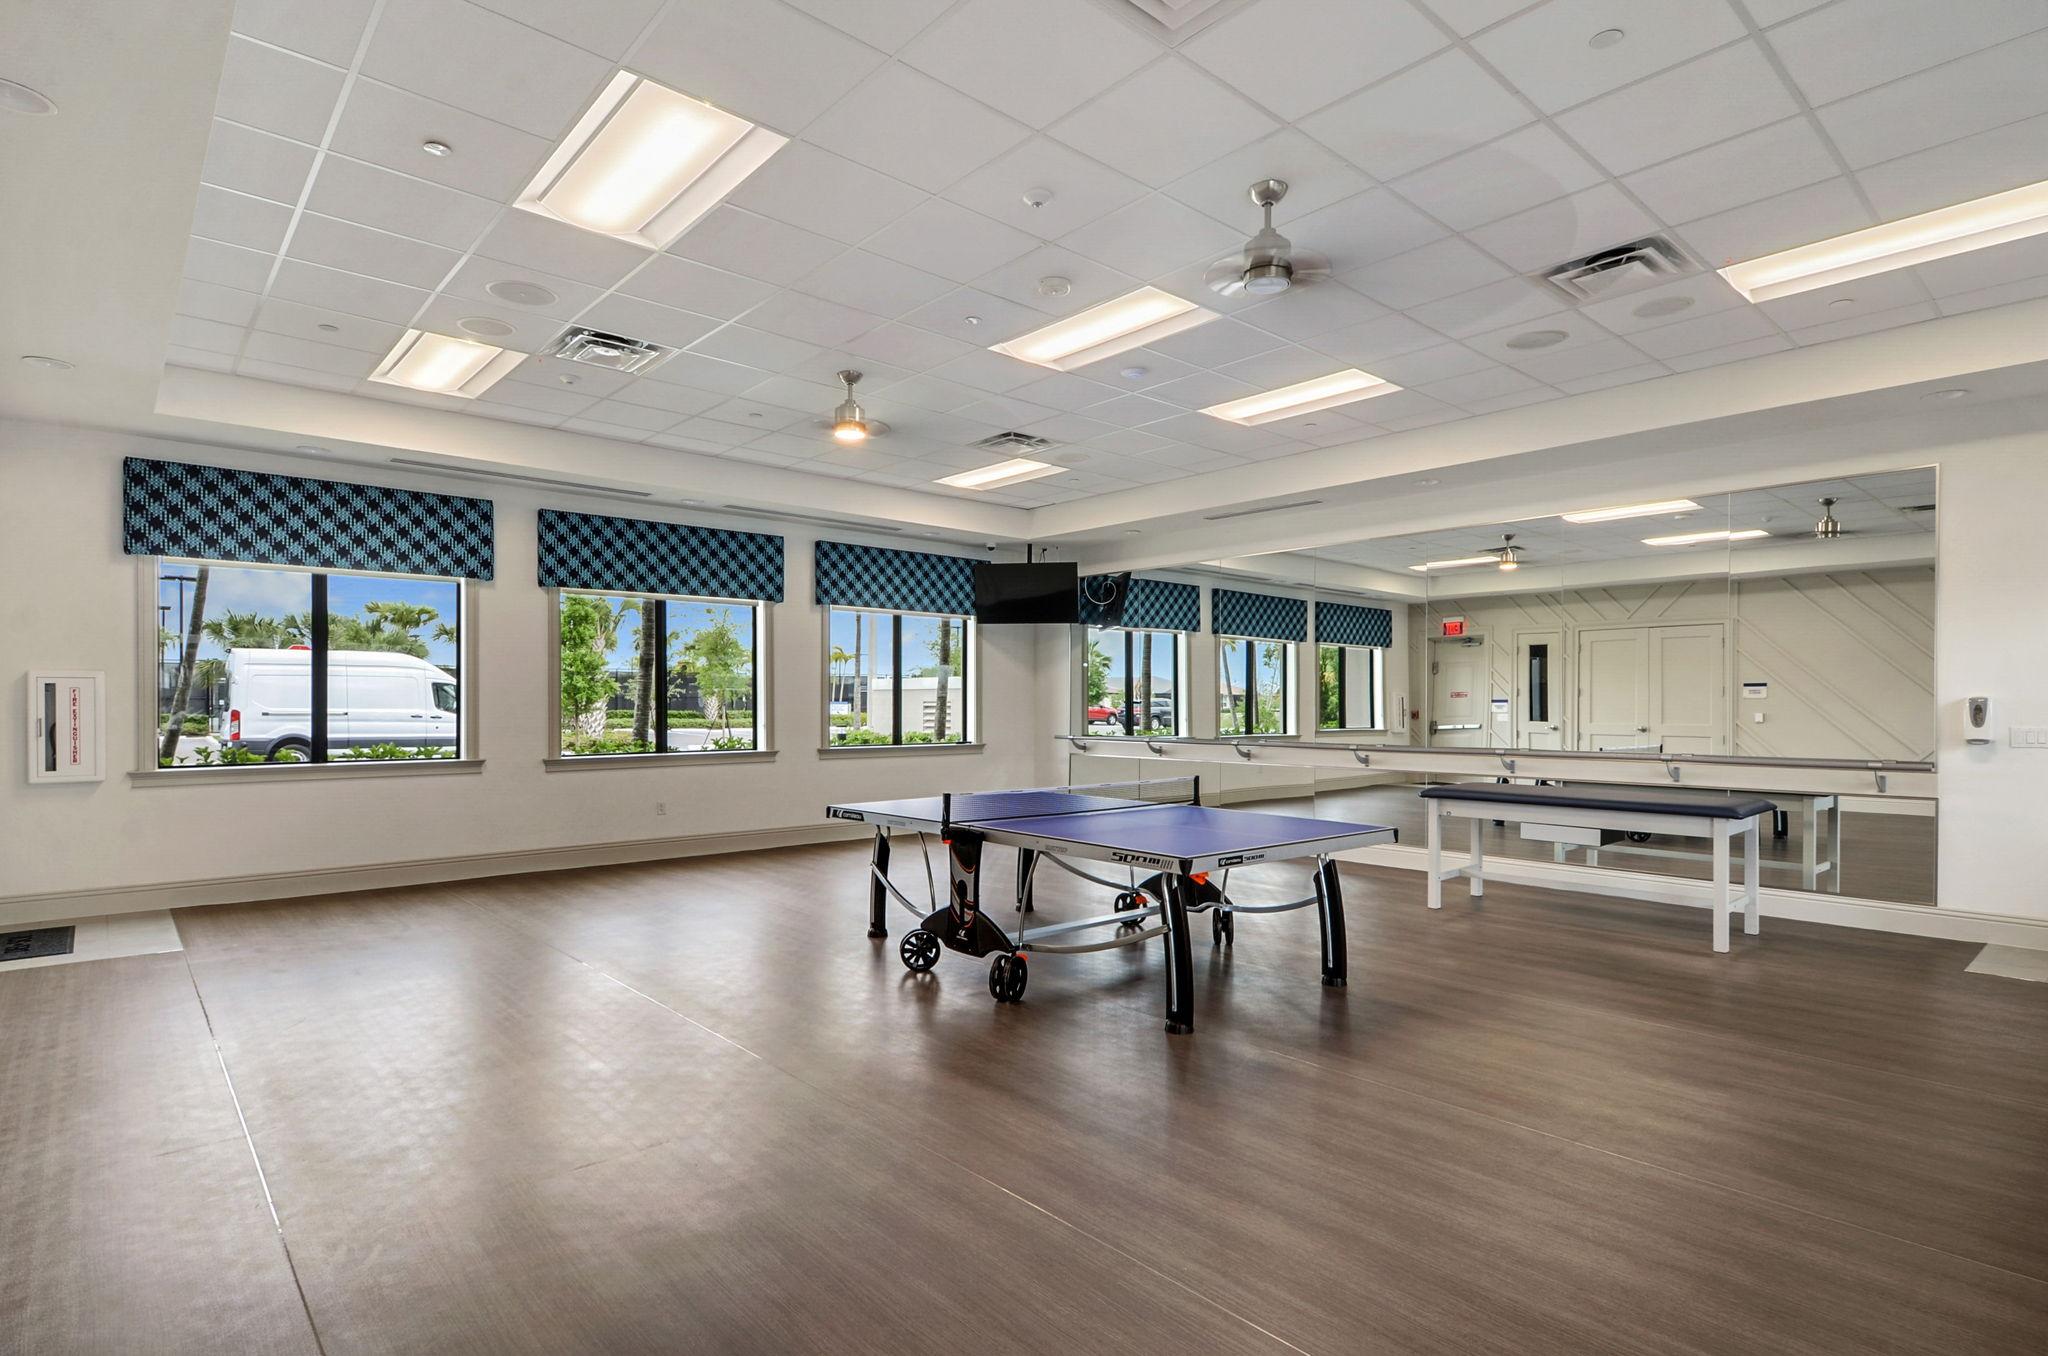 Exercise Studio/ Ping Pong